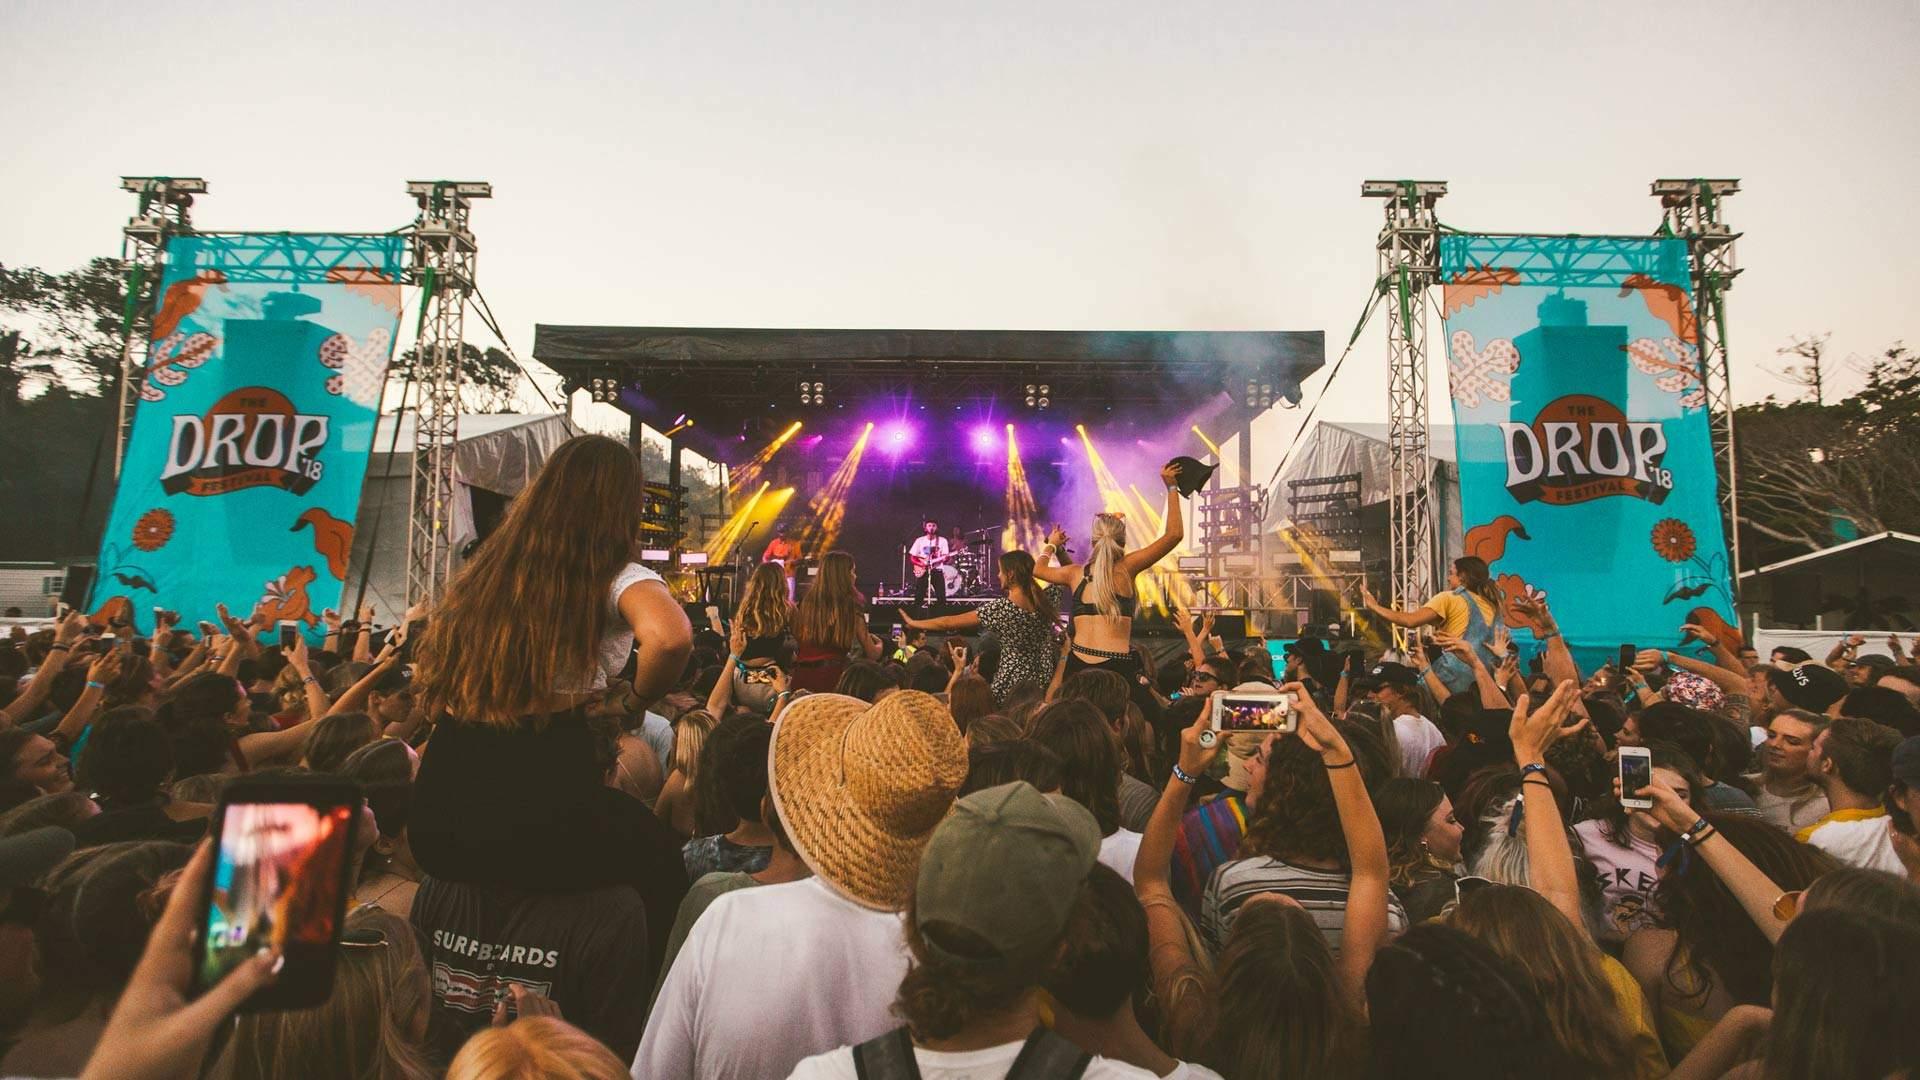 The Drop Festival 2019